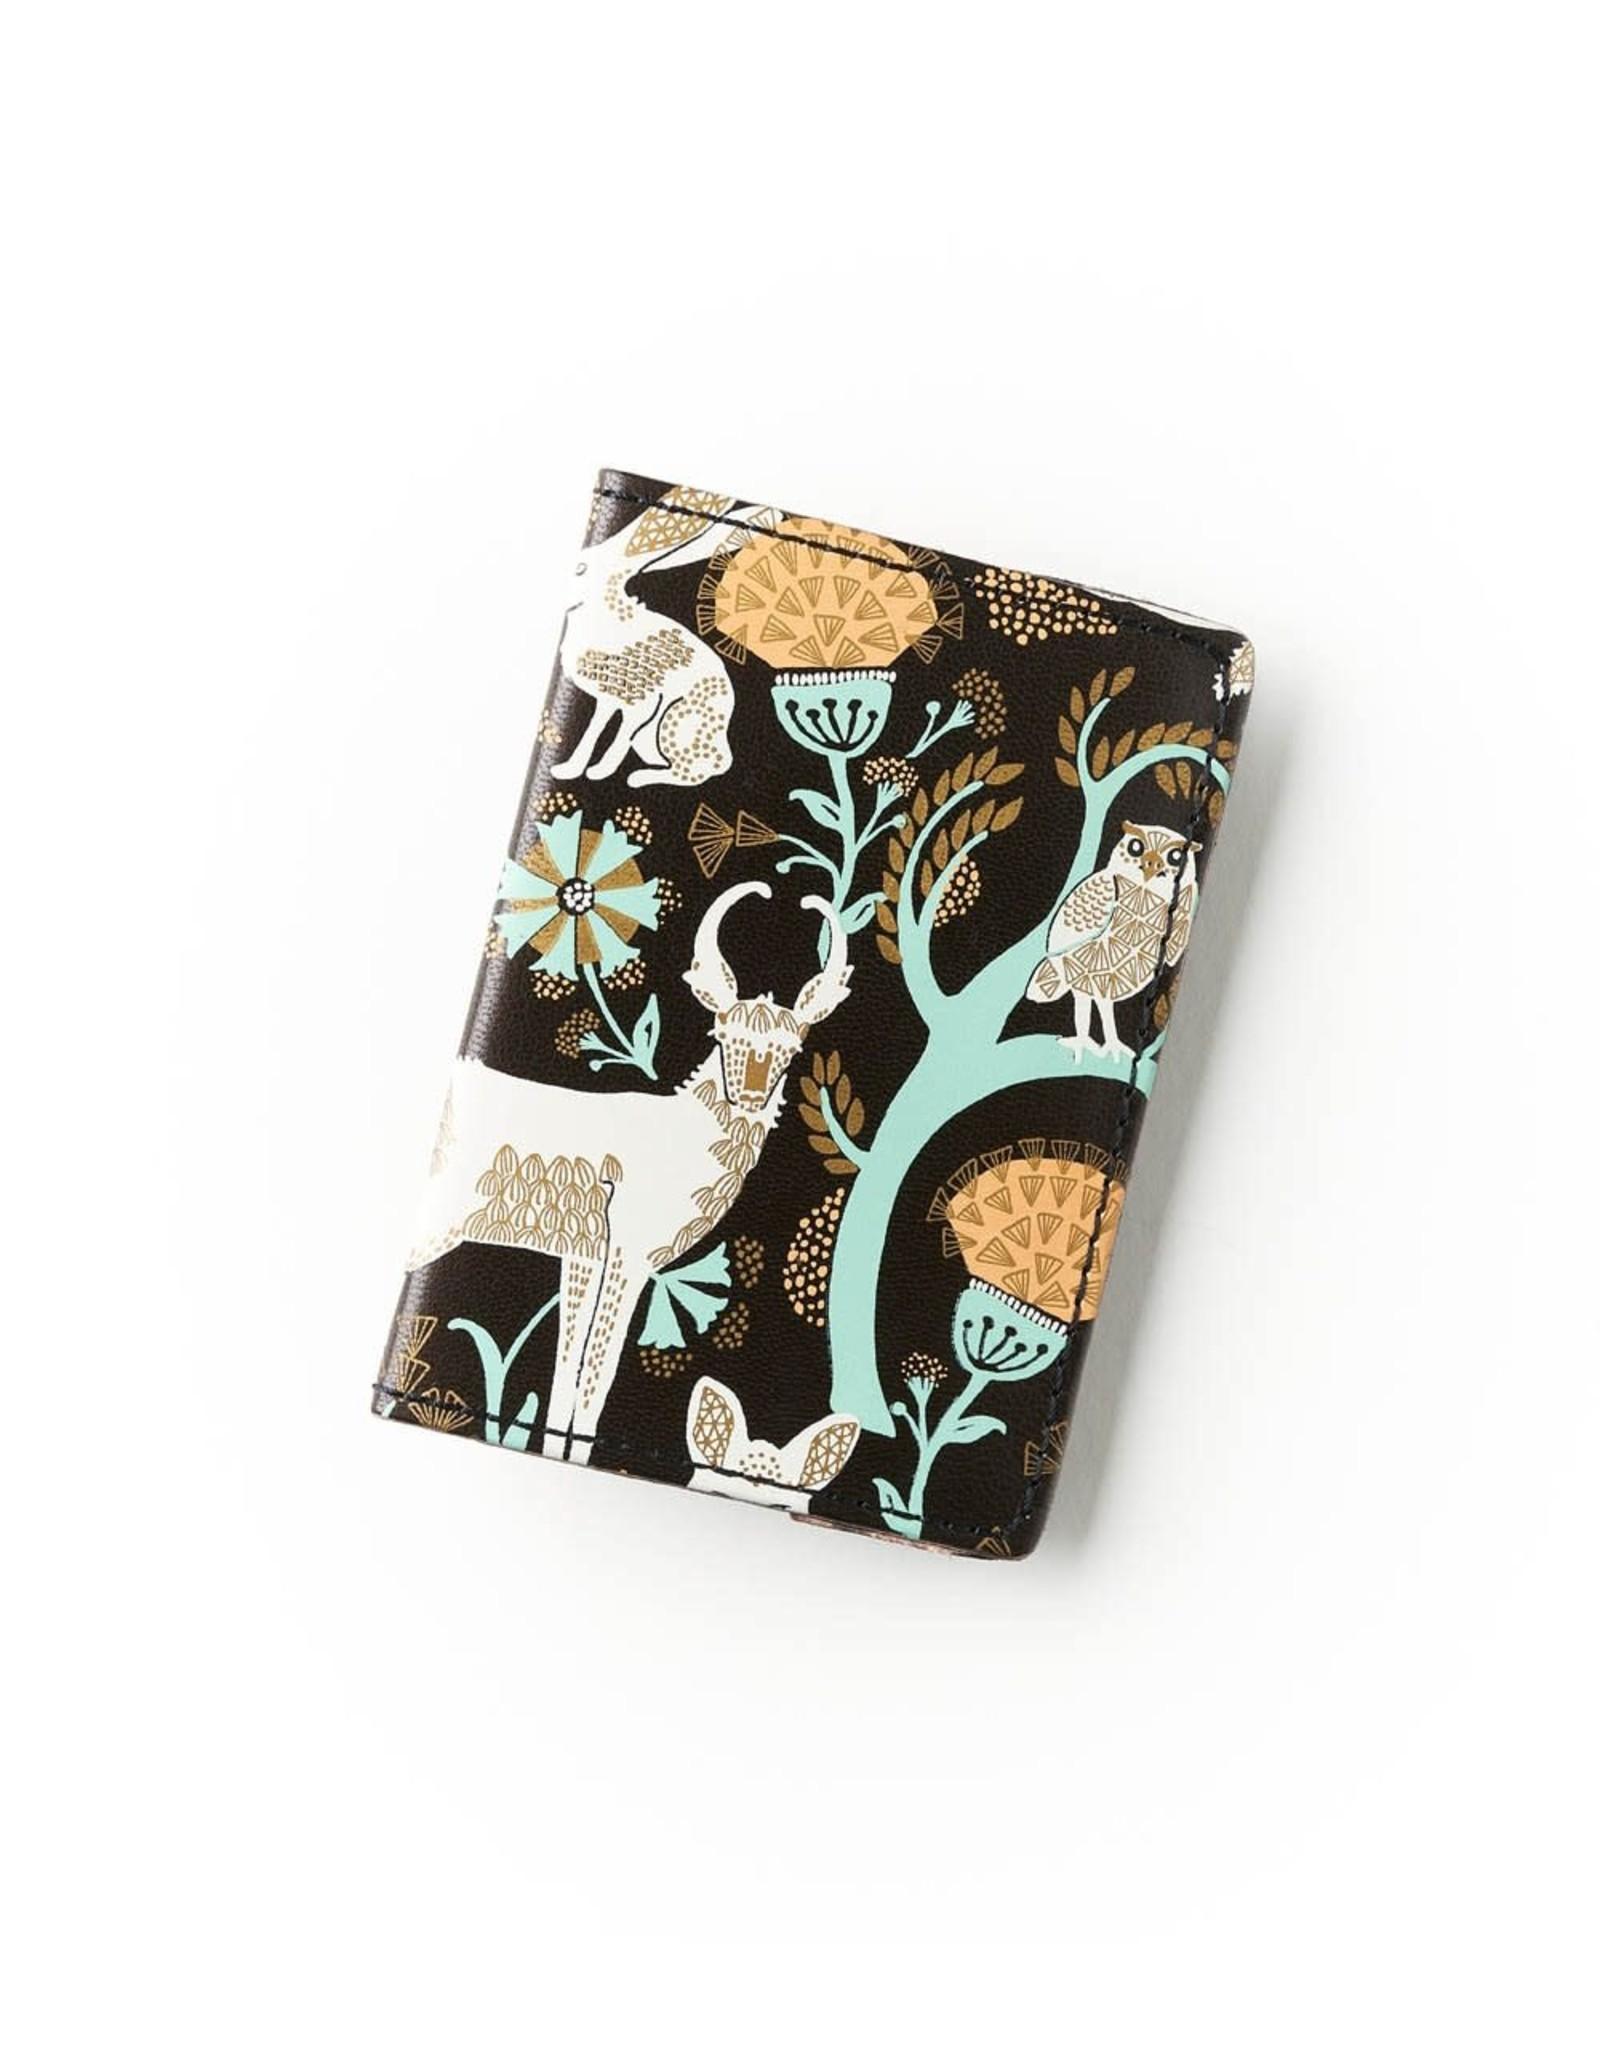 Matr Boomie Fauna Leather Passport Cover, India.